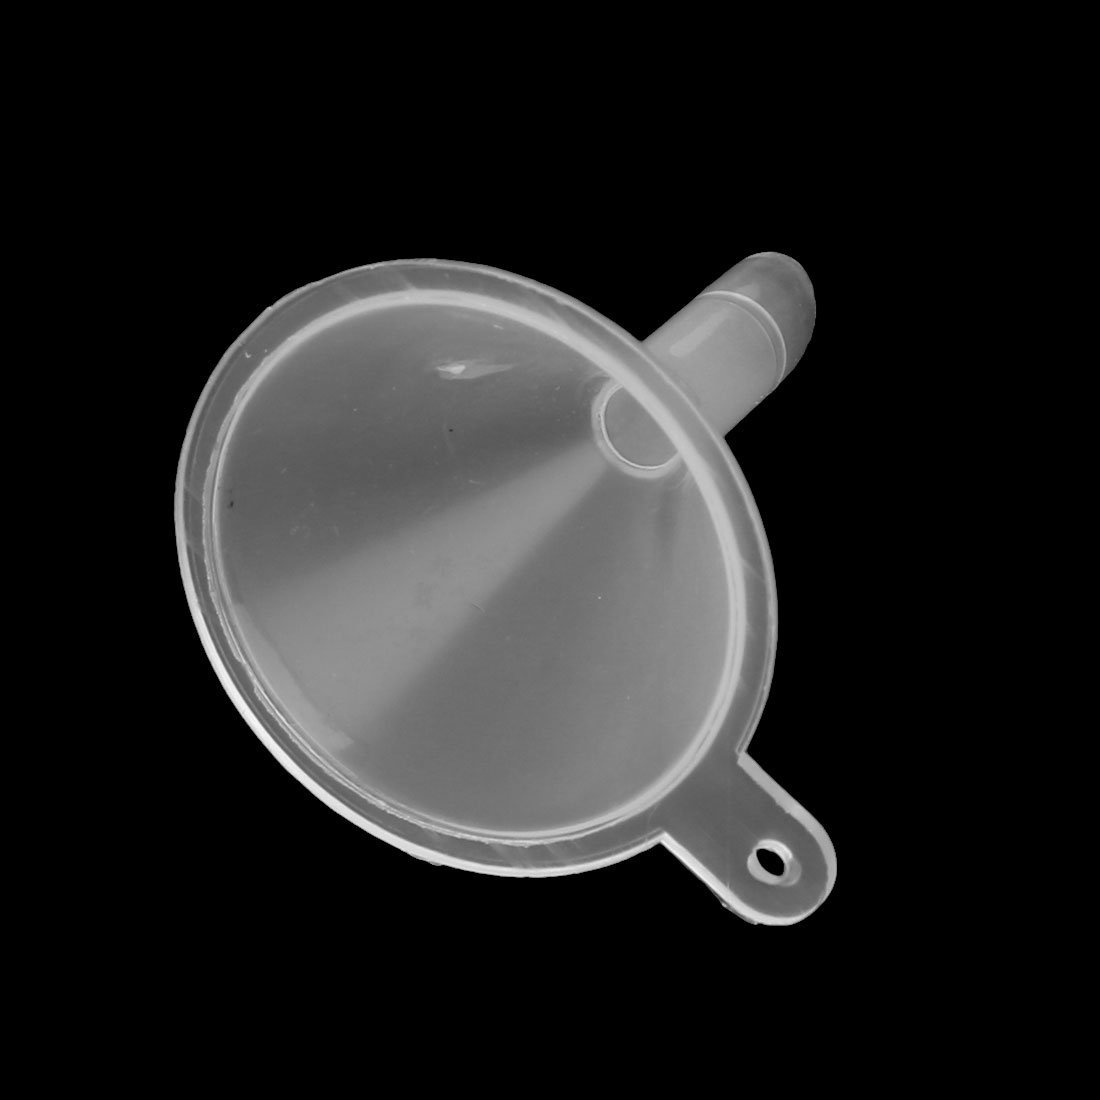 Amazon.com: Forma de viajes eDealMax Metal Cilindro de maquillaje líquida del agua de Perfume Botella del aerosol 10ml: Health & Personal Care